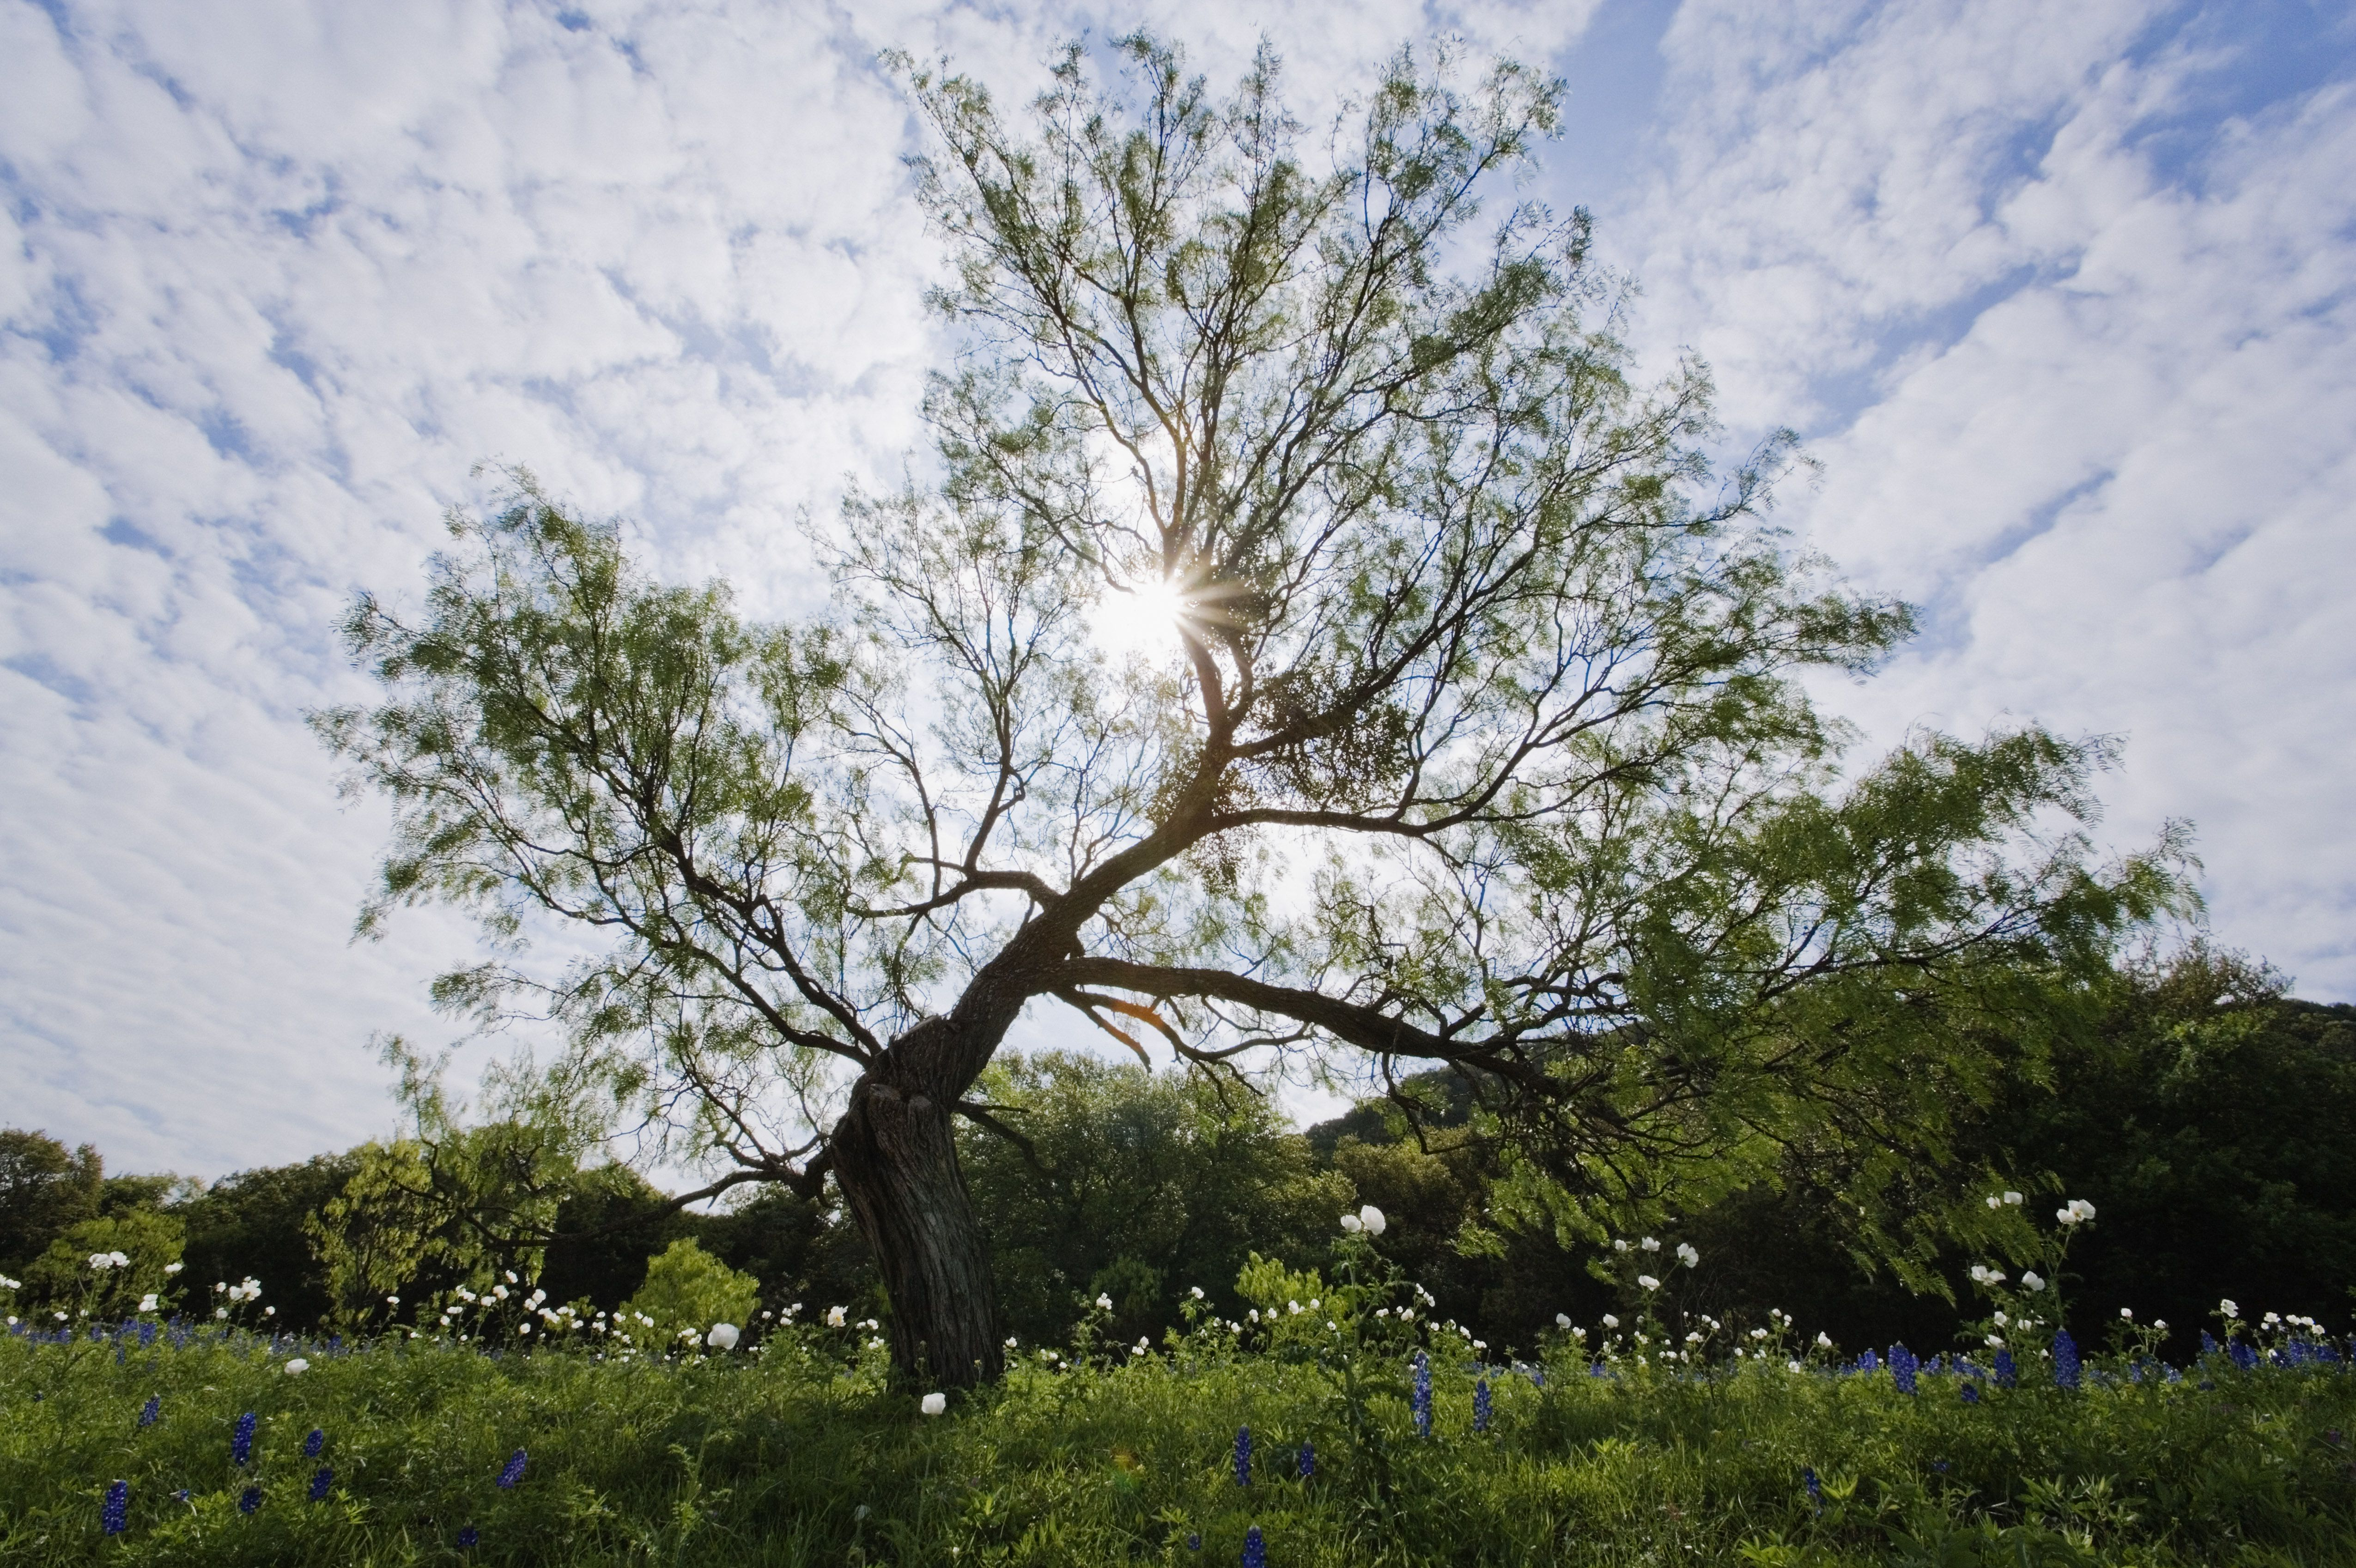 Mesquite Tree, Texas Hill Country, Texas, USA